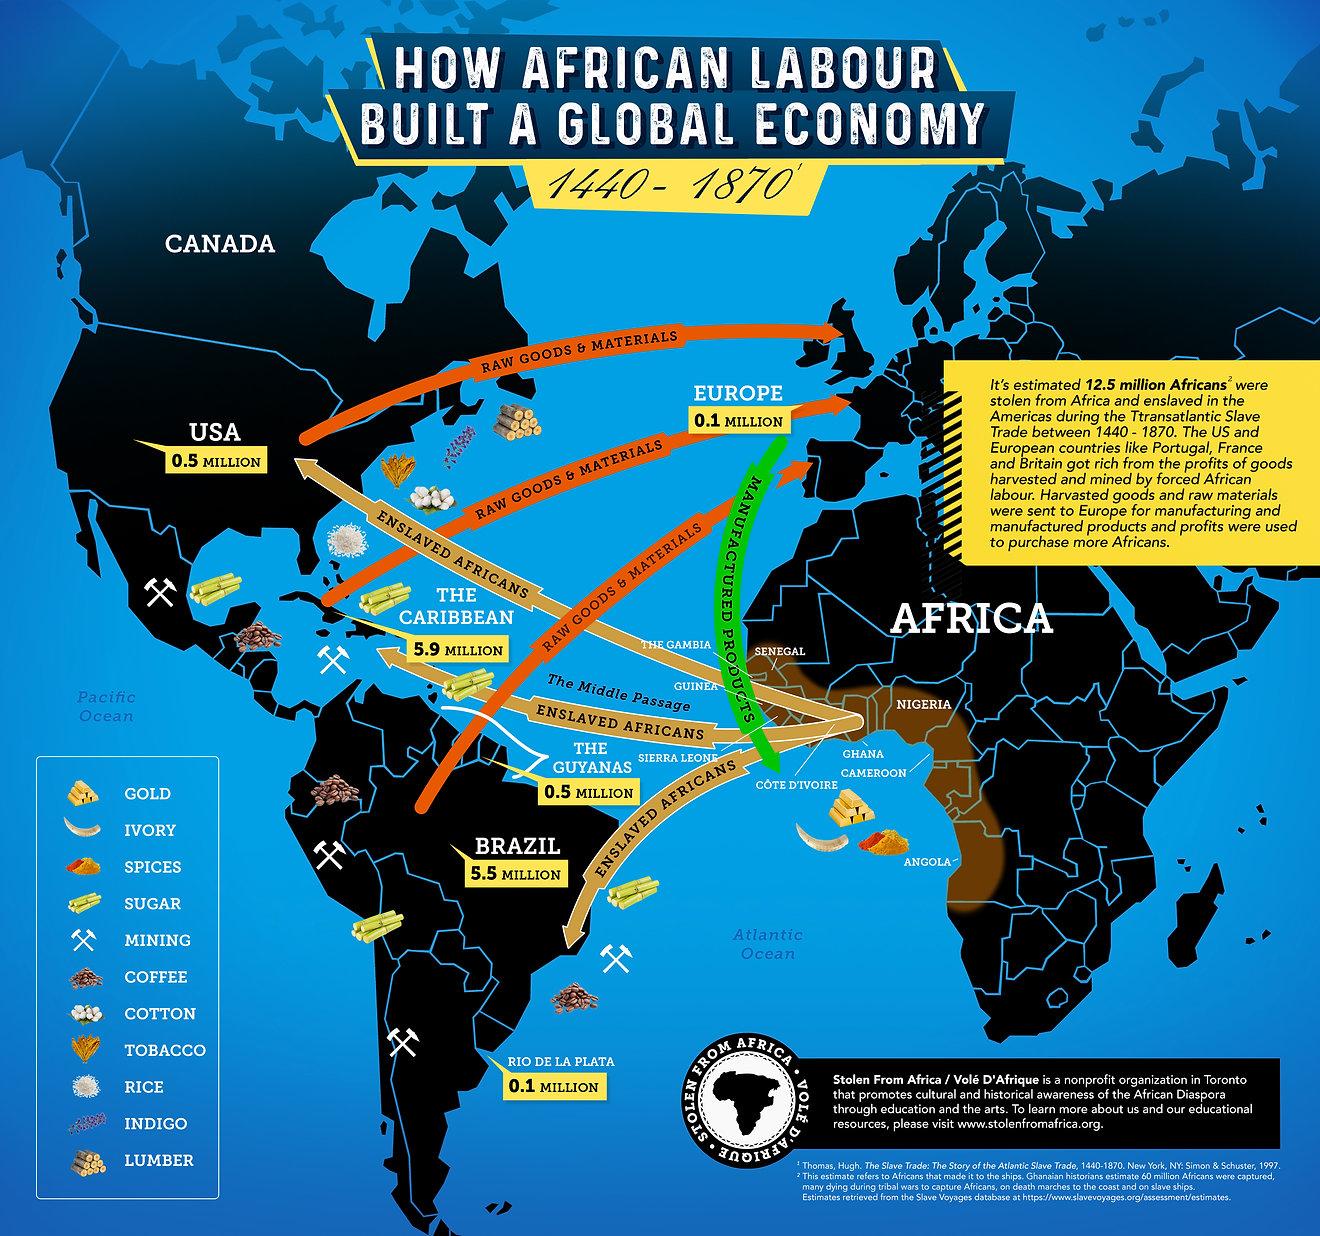 Transatlantic-Slave-Trade-Infographic-3.